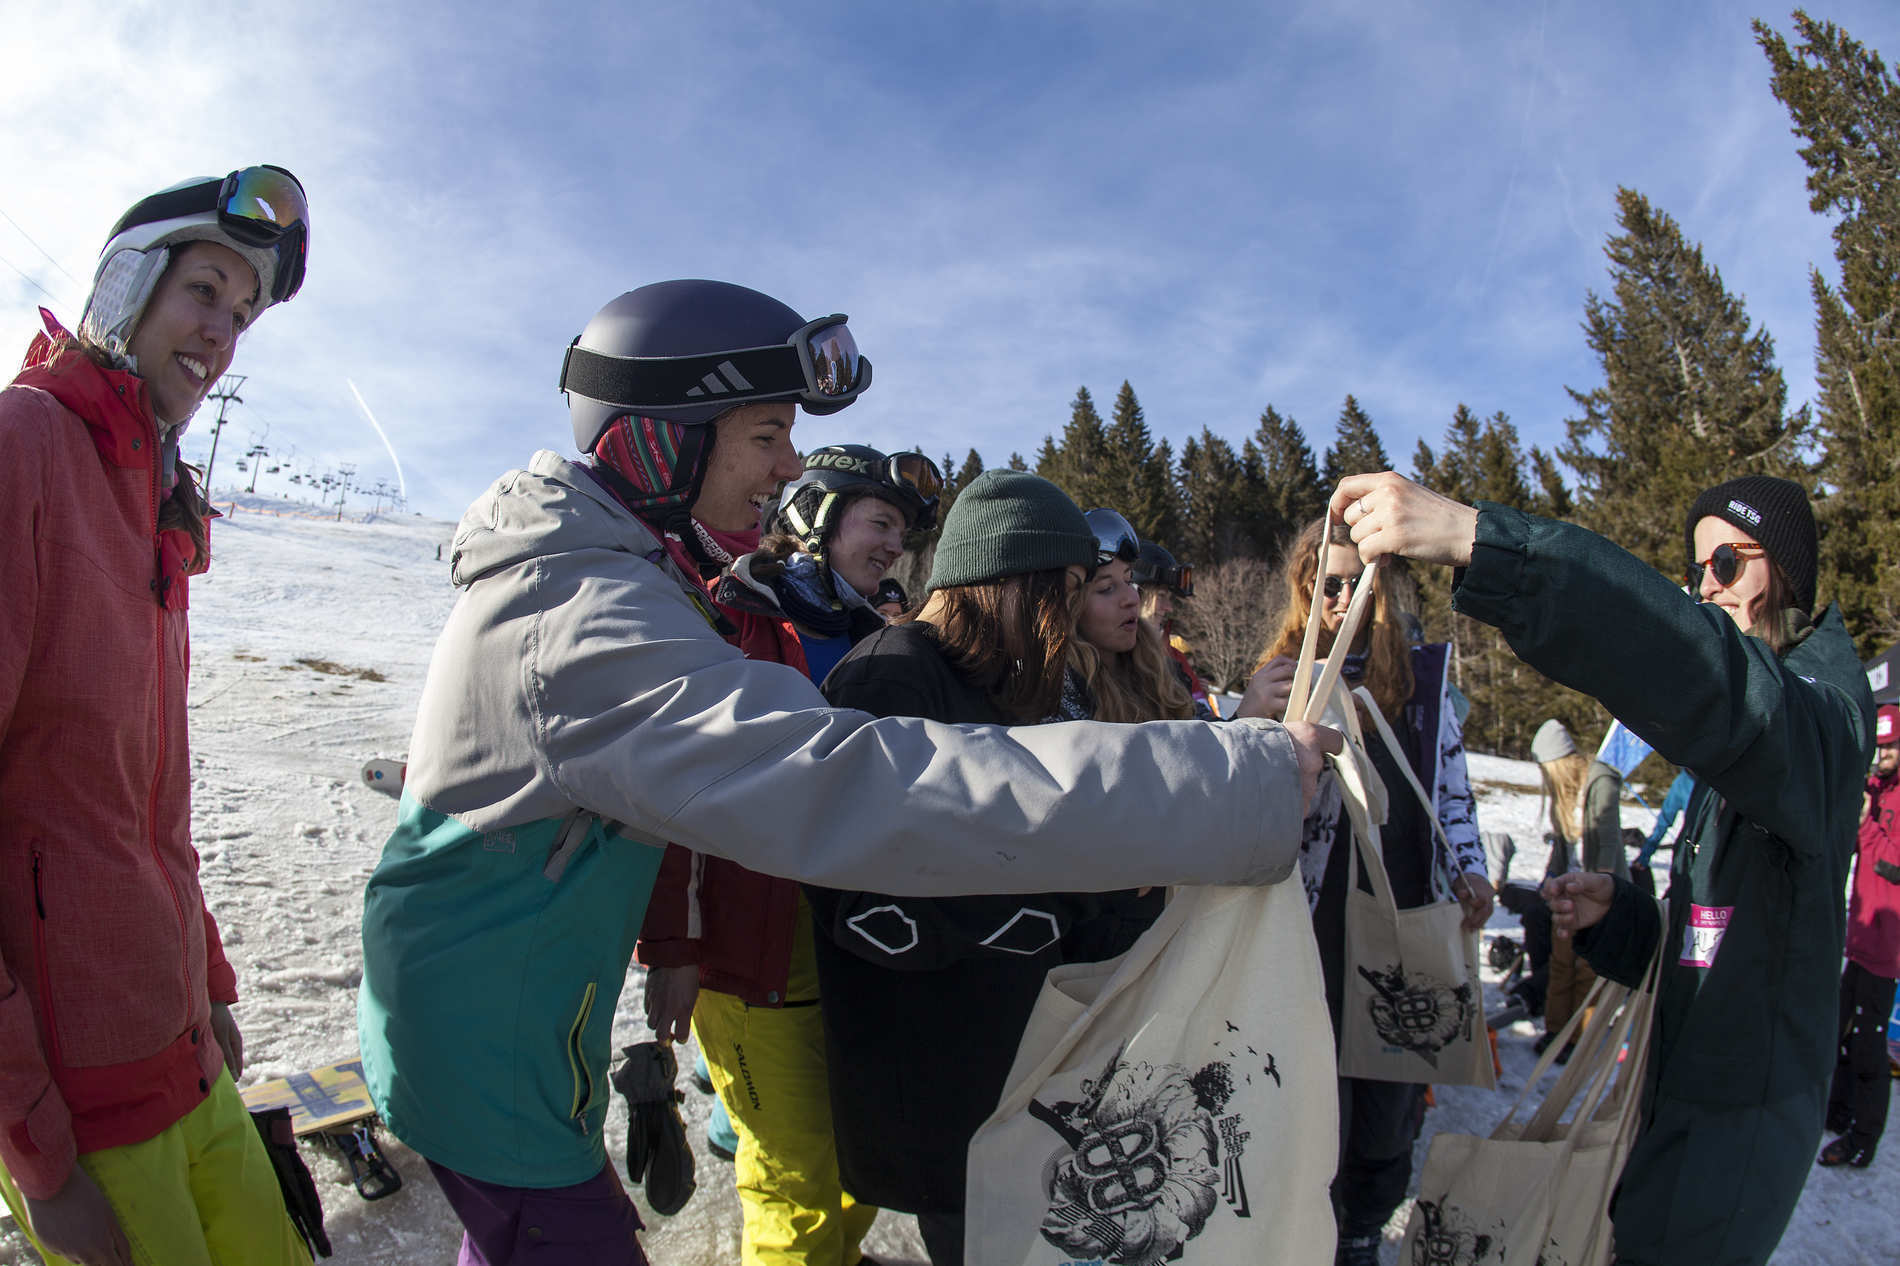 web snowpark feldberg 25 02 2017 lifestyle fs sb martin herrmann qparks 29